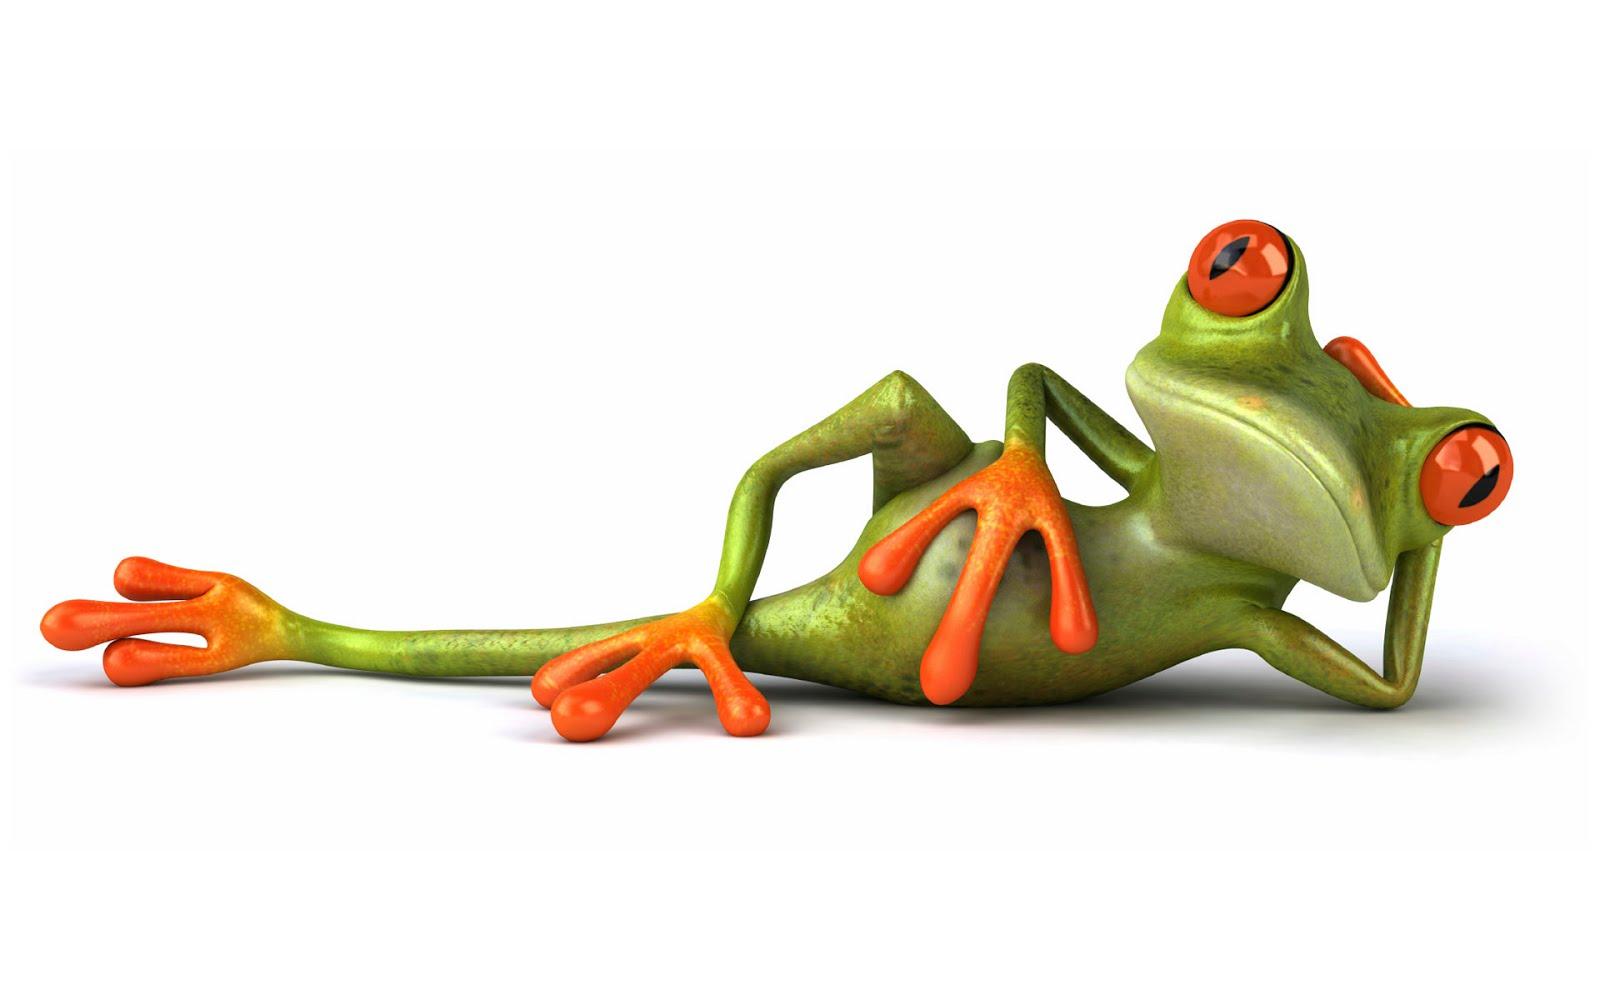 Cartoon Frogs Wallpaper Cartoon Images 1600x1000